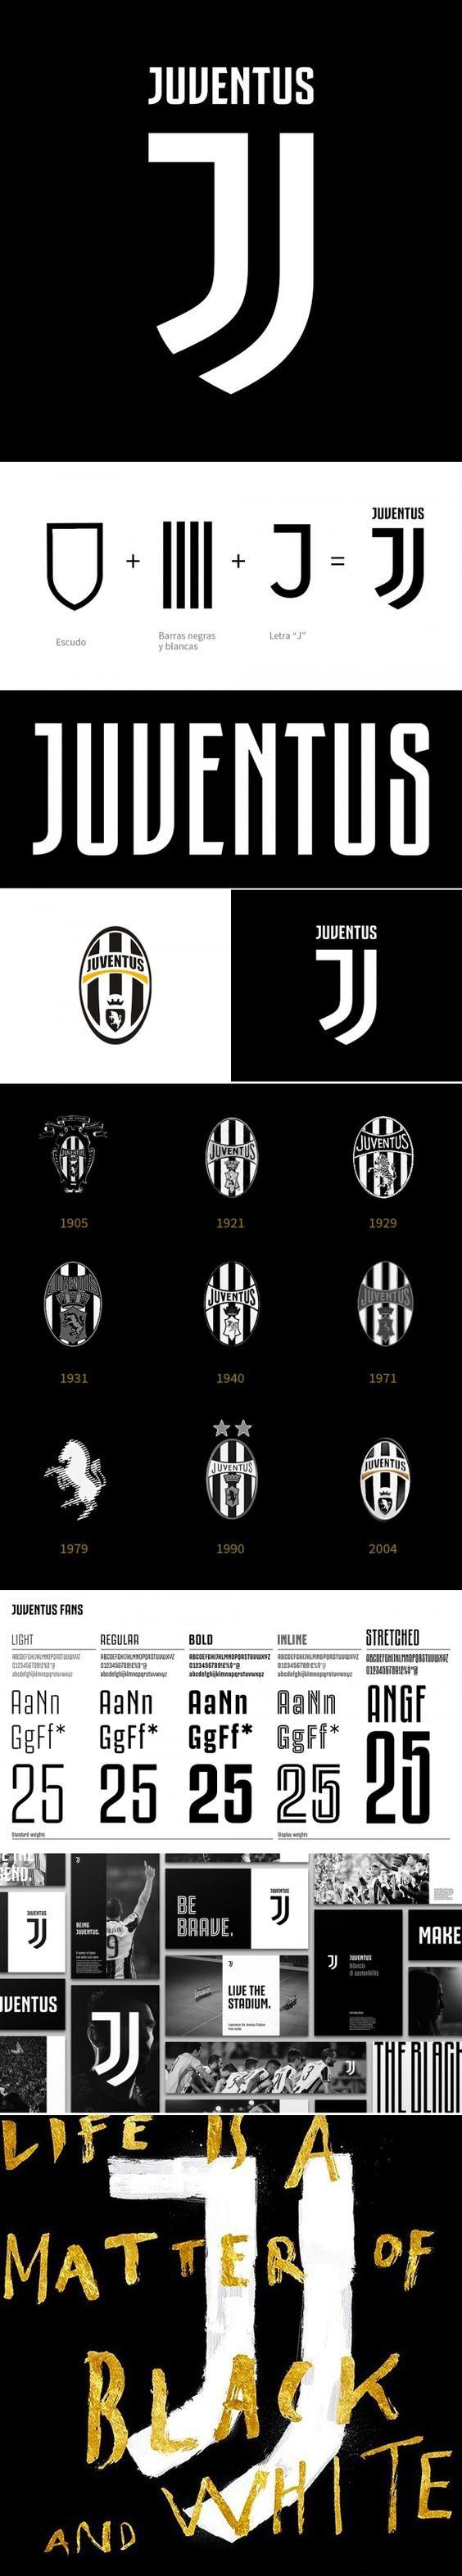 Search Juventus On Designspiration In 2021 Brand Guidelines Book Logo Design Typography Branding Design Inspiration